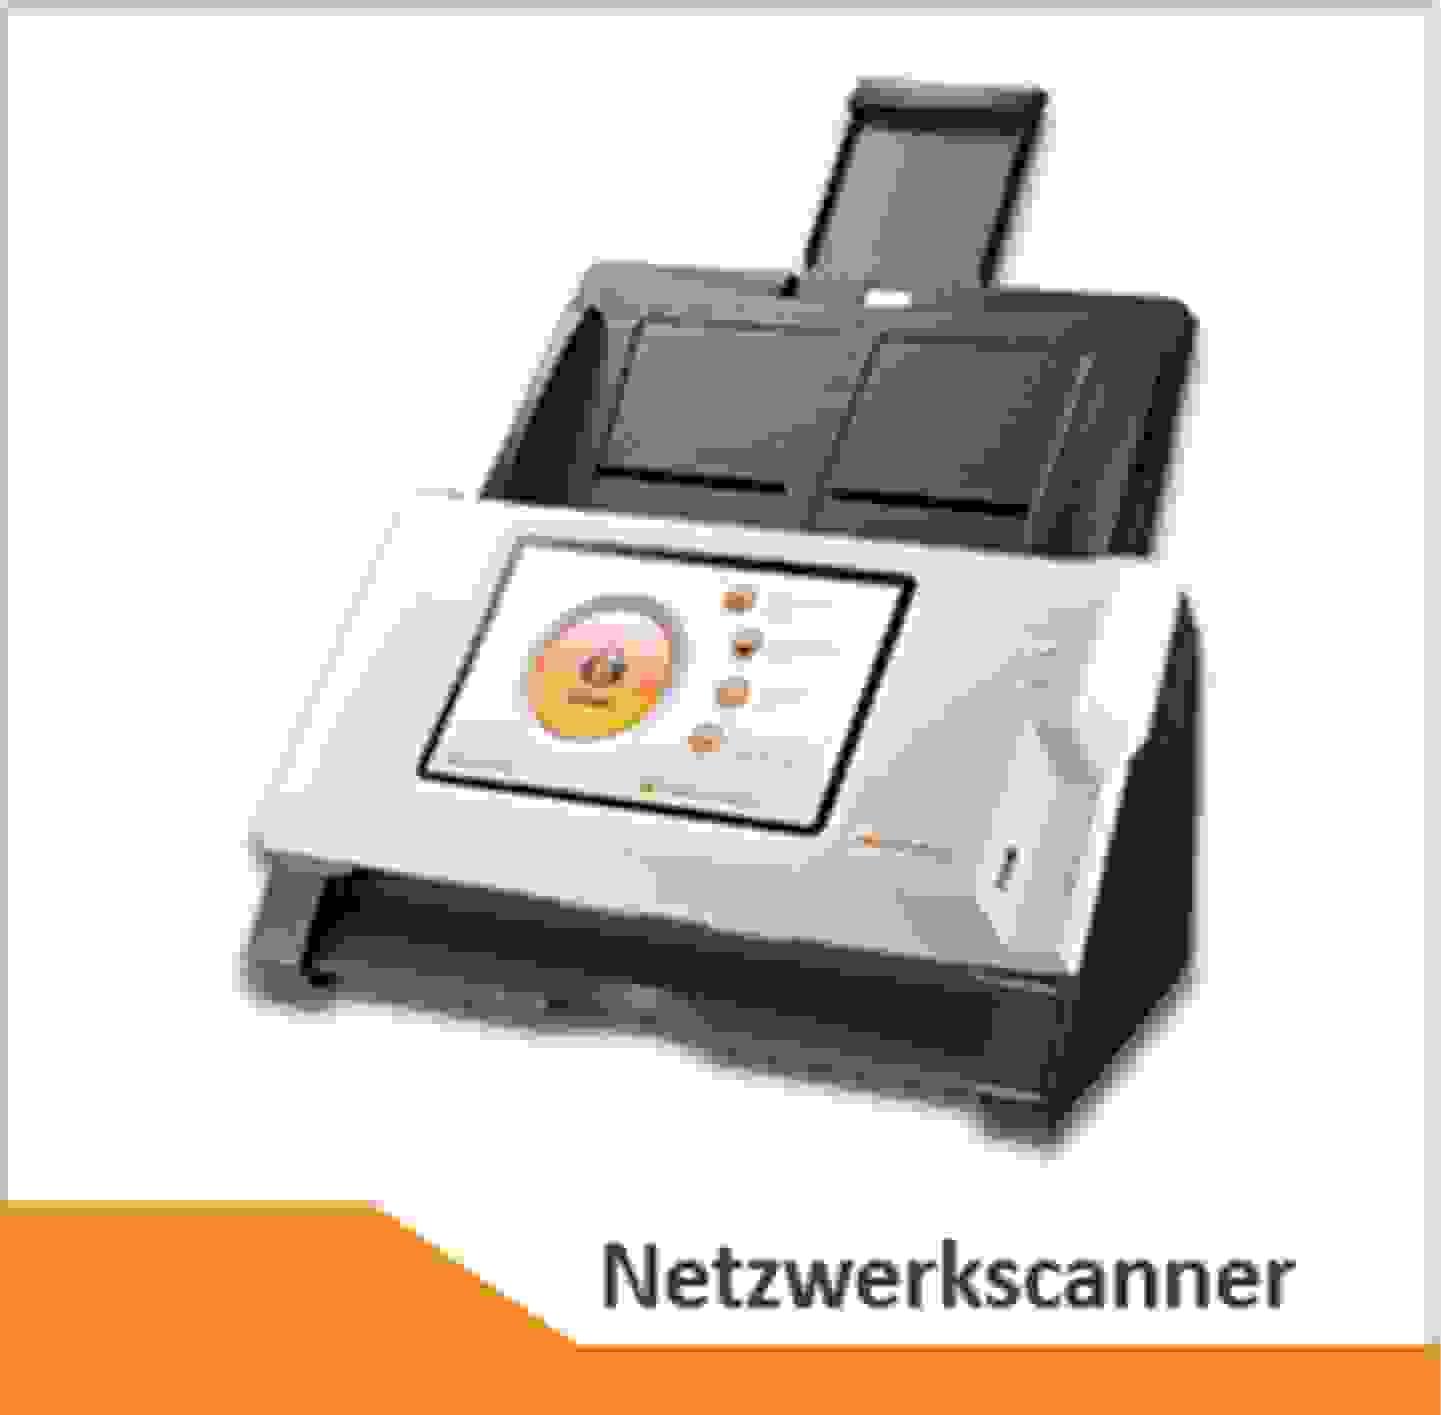 Netzwerkscanner